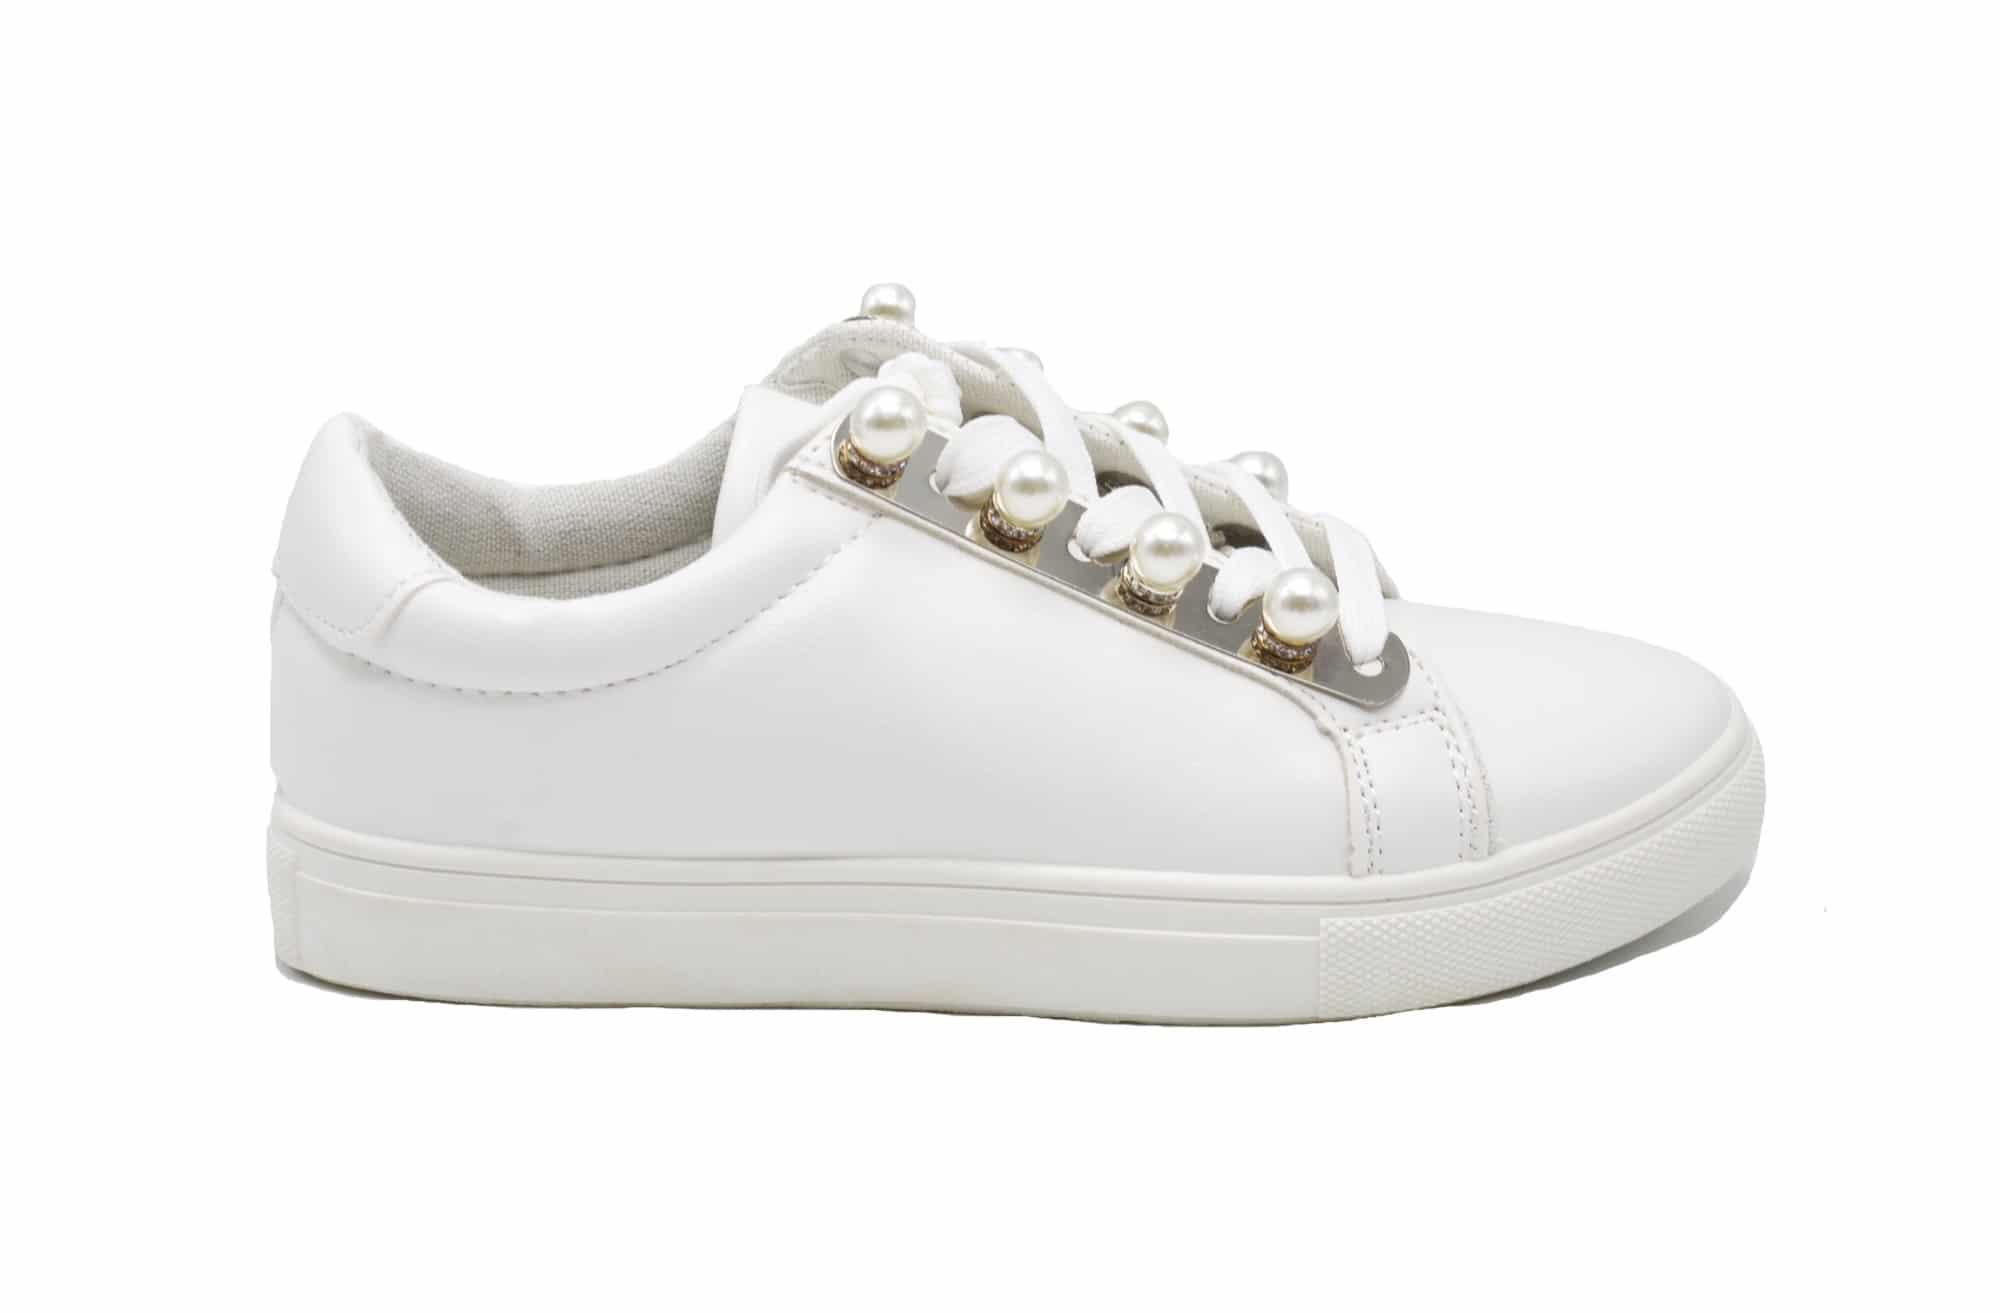 09f012c917628 SHY51   Baskets Tennis Sneakers Basses Simili Cuir Blanc avec Perles ...